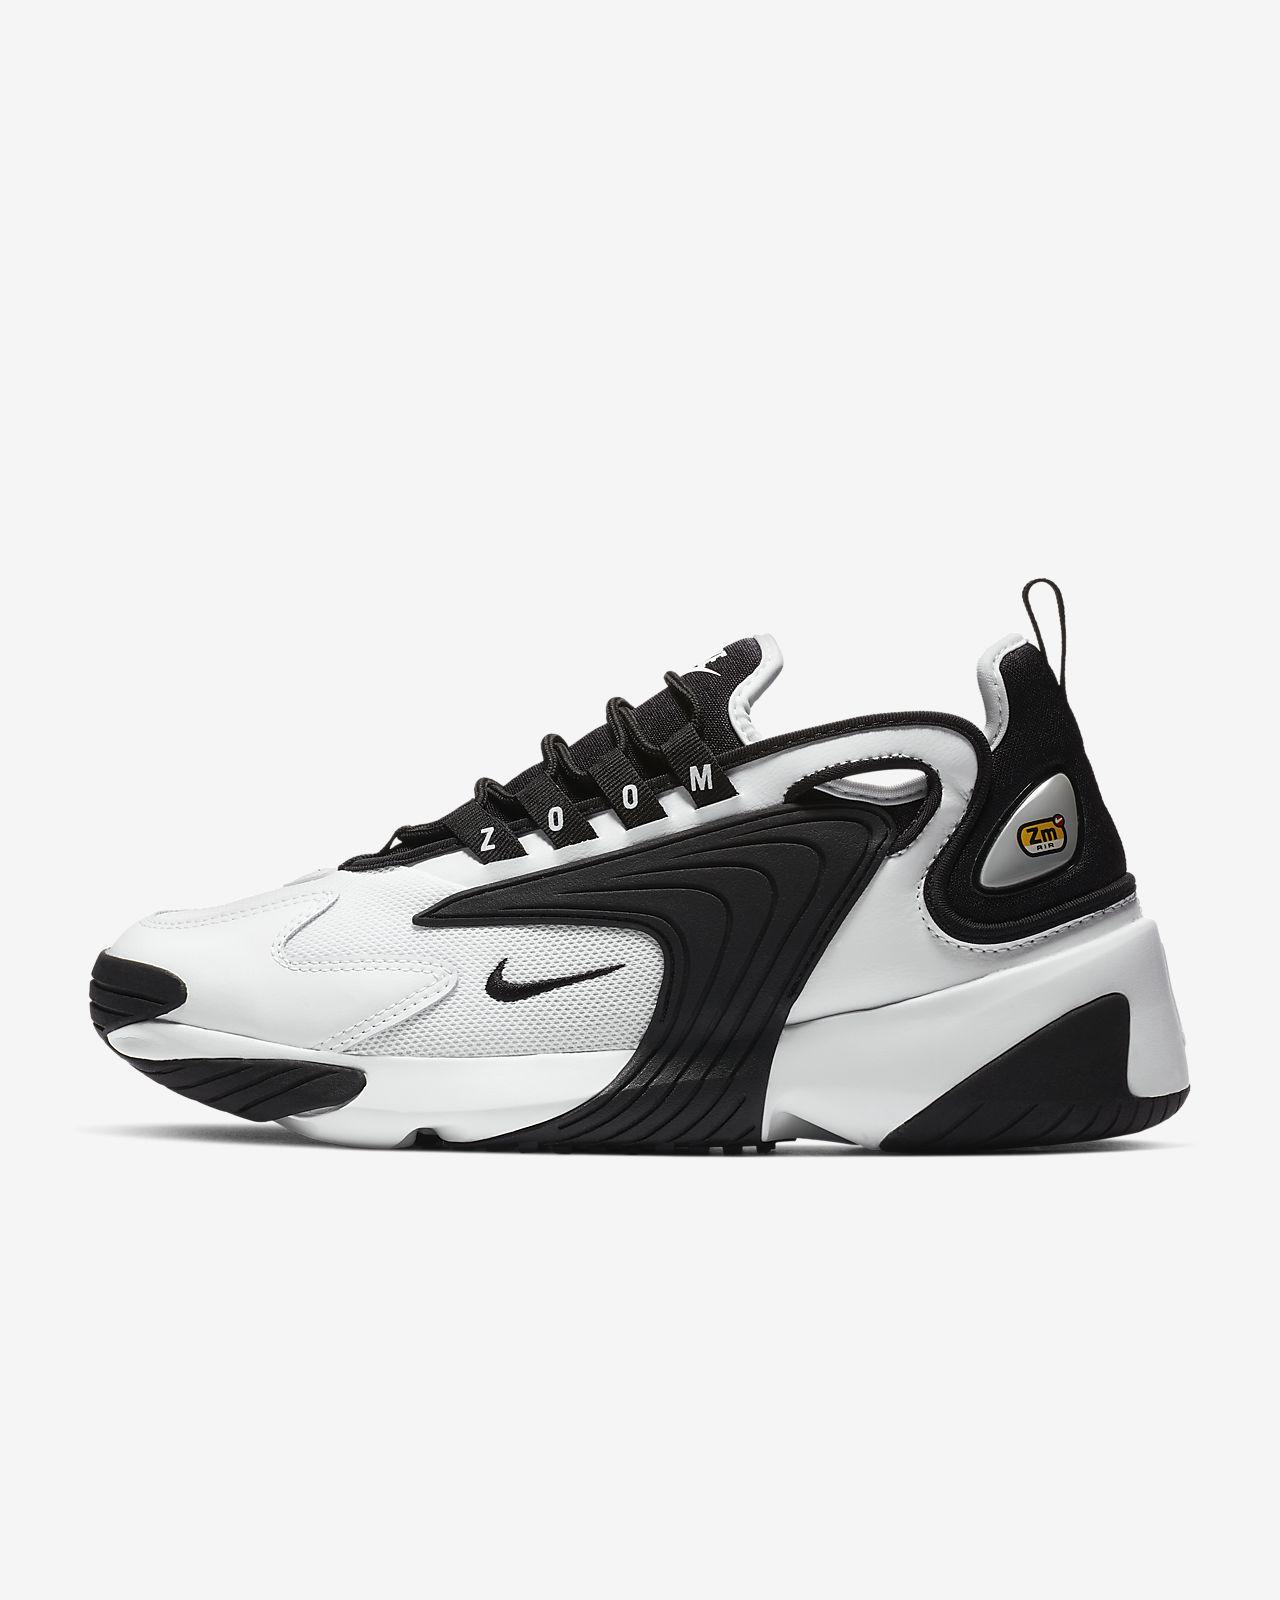 Dámská bota Nike Zoom 2K